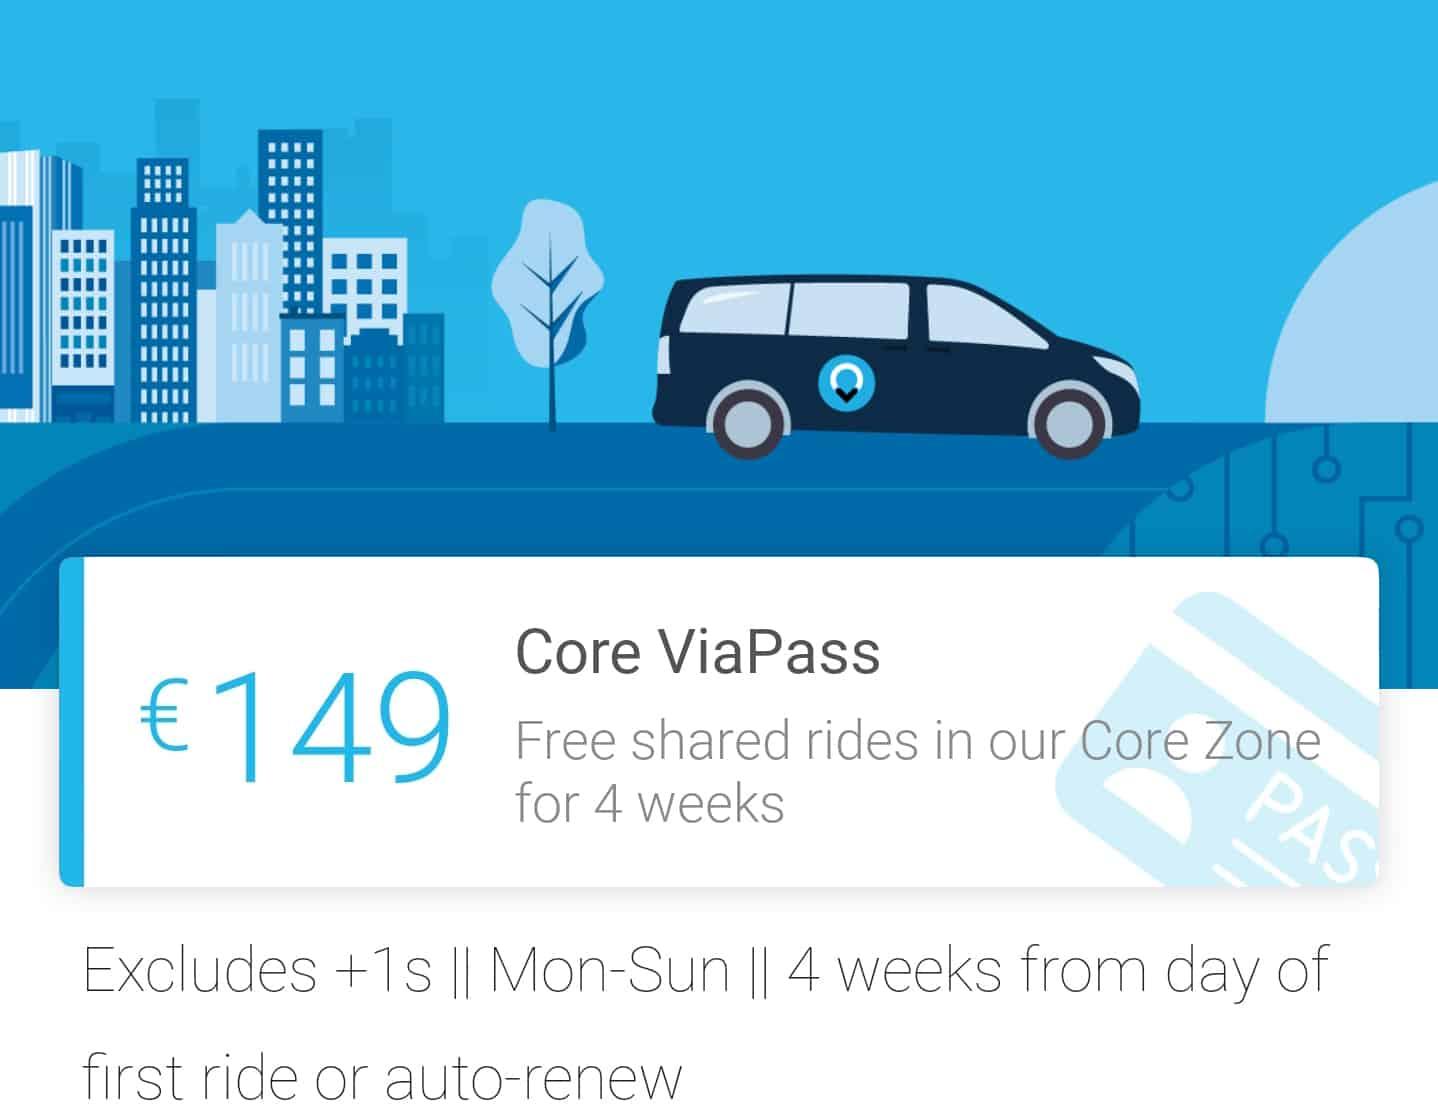 Core ViaPass bundel met 4 gedeelde ritten in de core per week